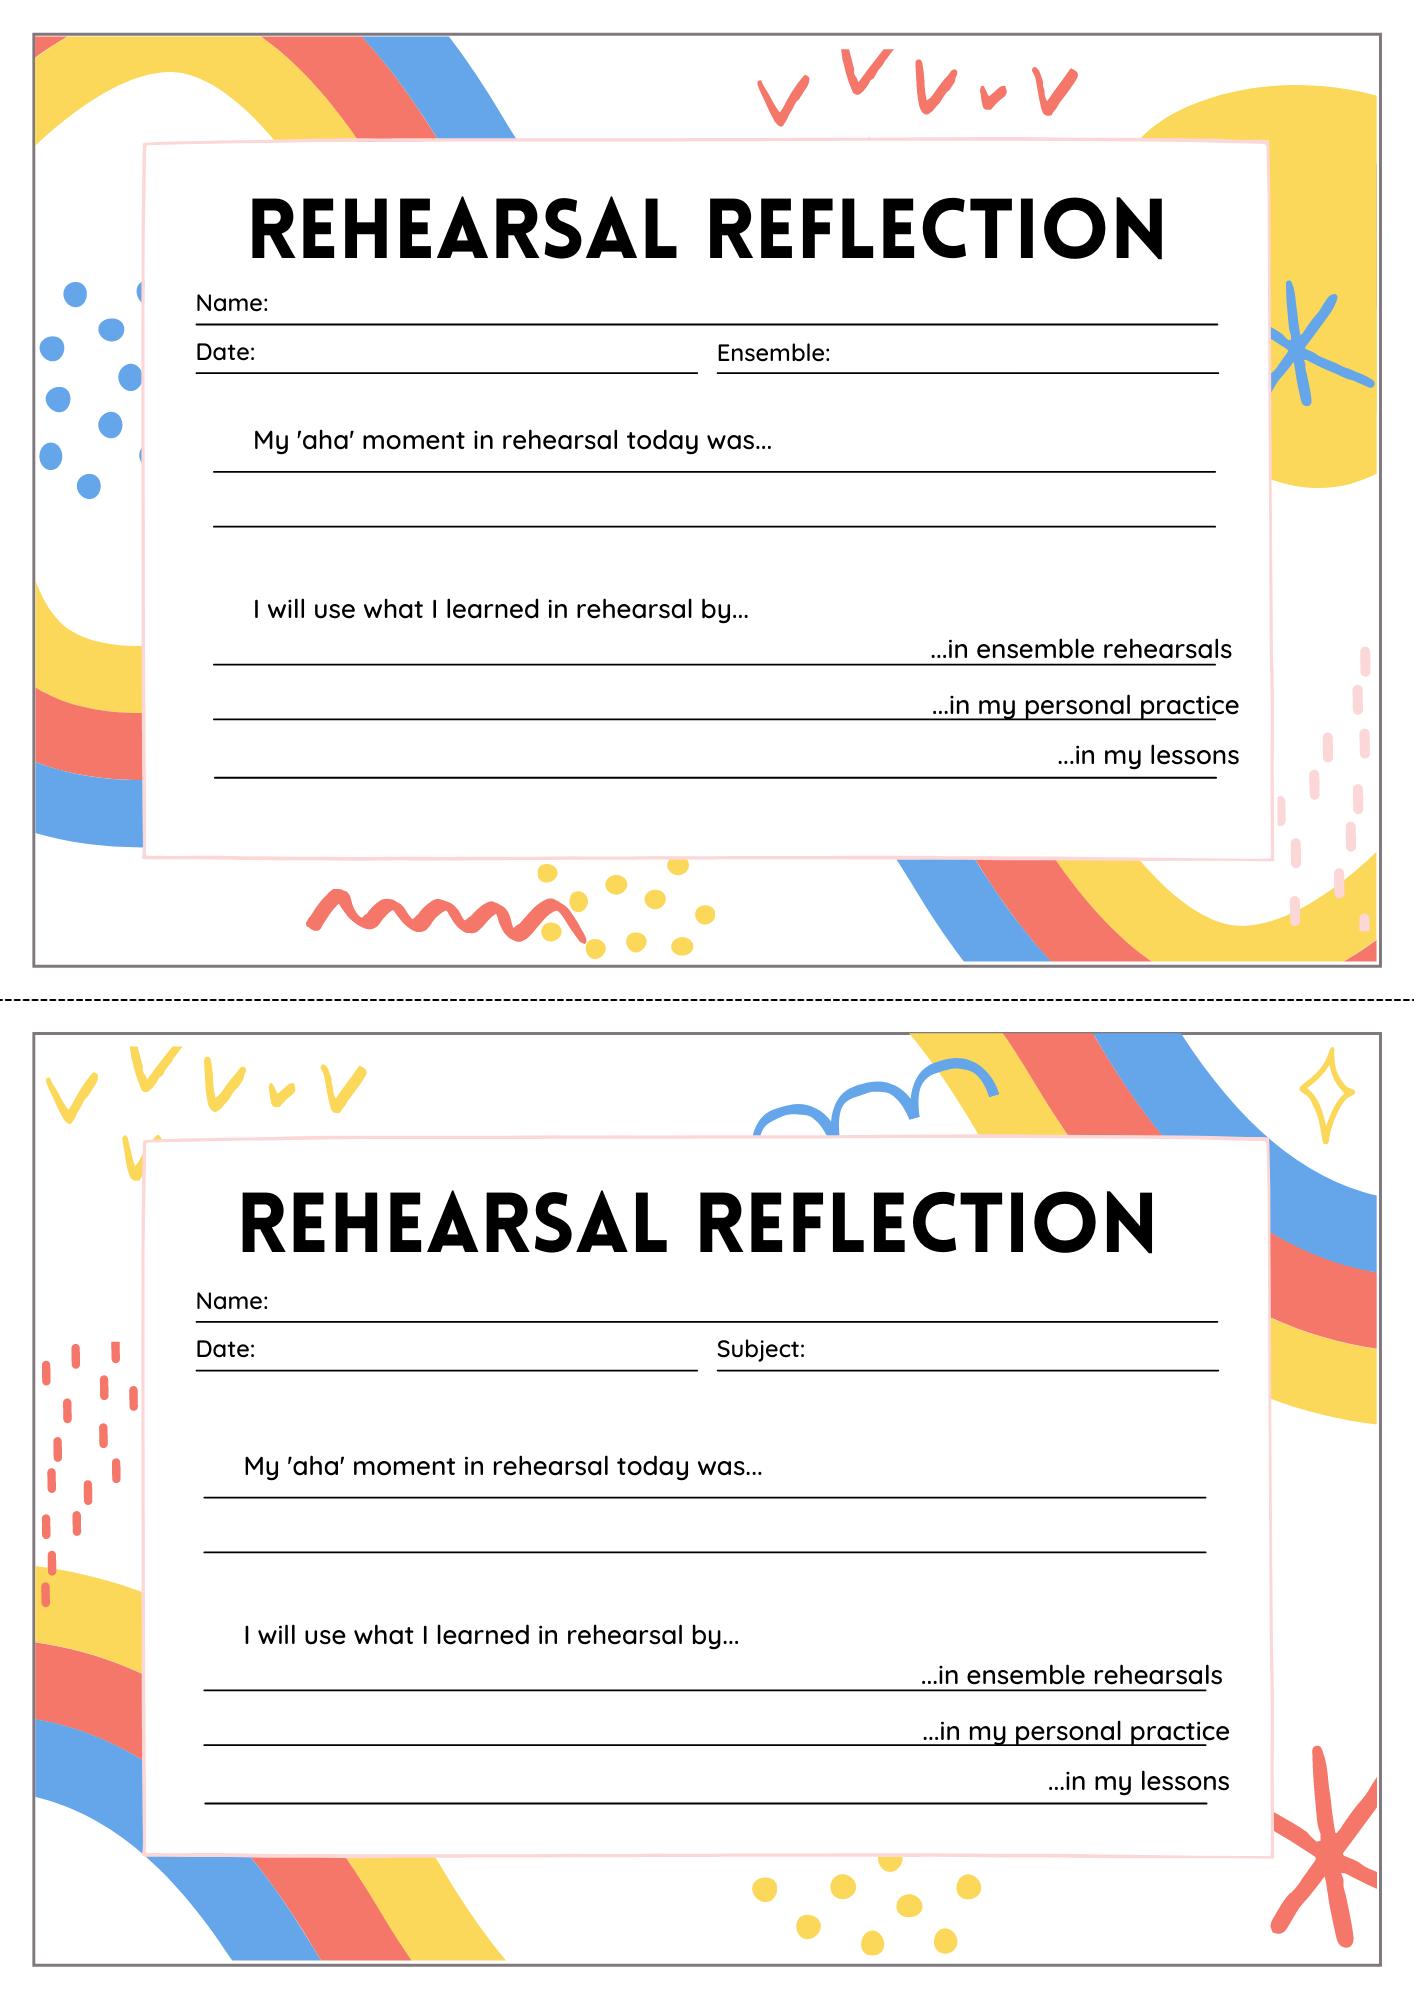 Rehearsal Reflection example